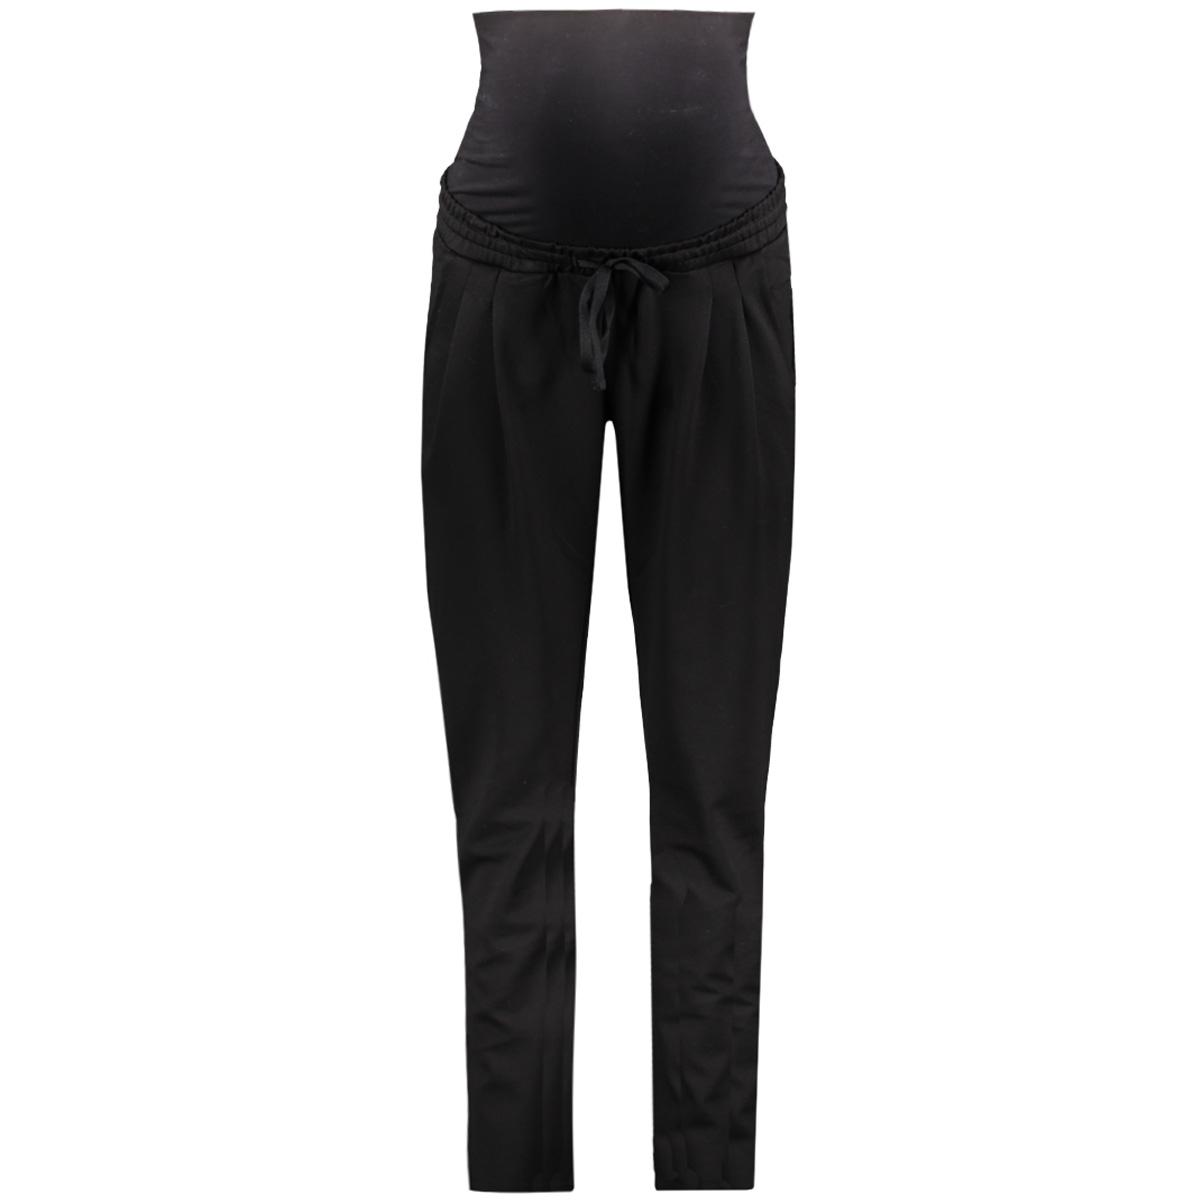 mllif jersey pants s-noos 20007421 mama-licious positie broek black